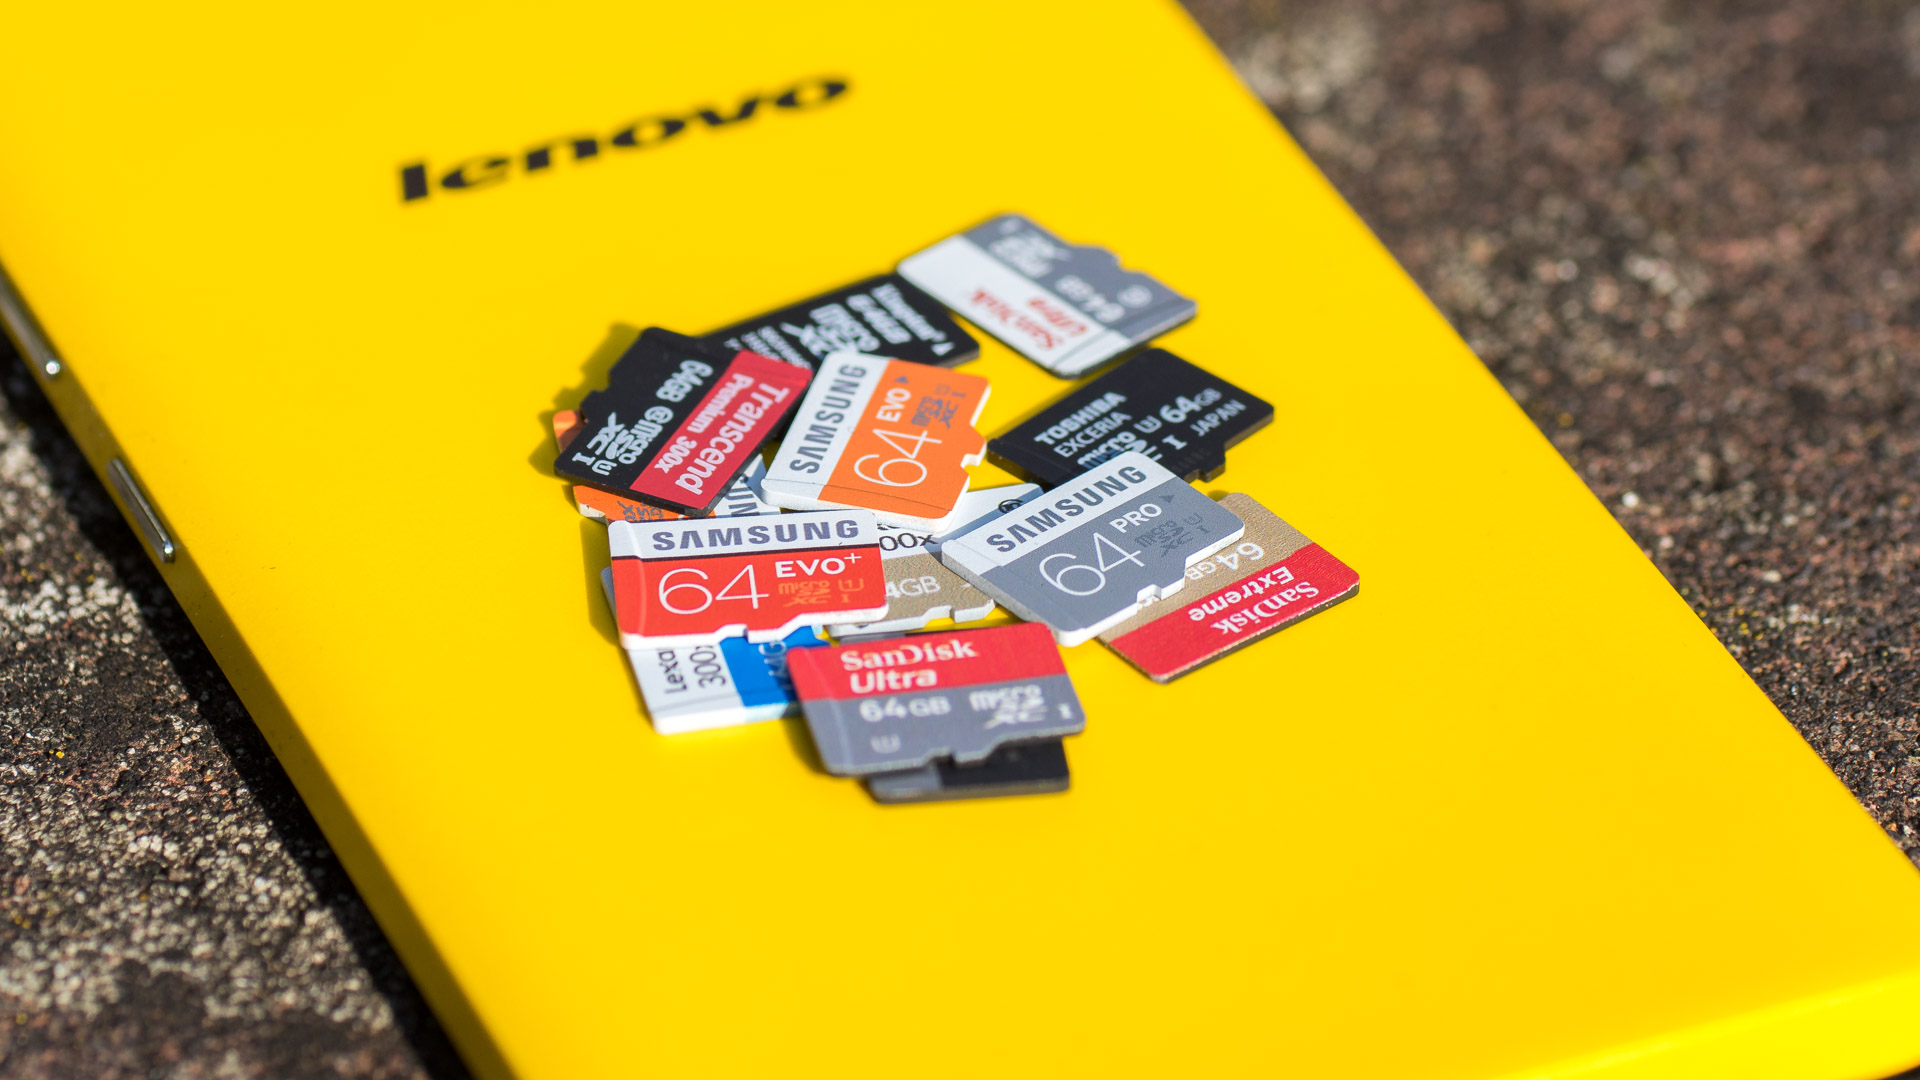 13x 64GB MicroSD Speicherkarten im Test von Samsung Lexar SanDisk Toshiba Kingston Transcend SD Review 2015 aktuell